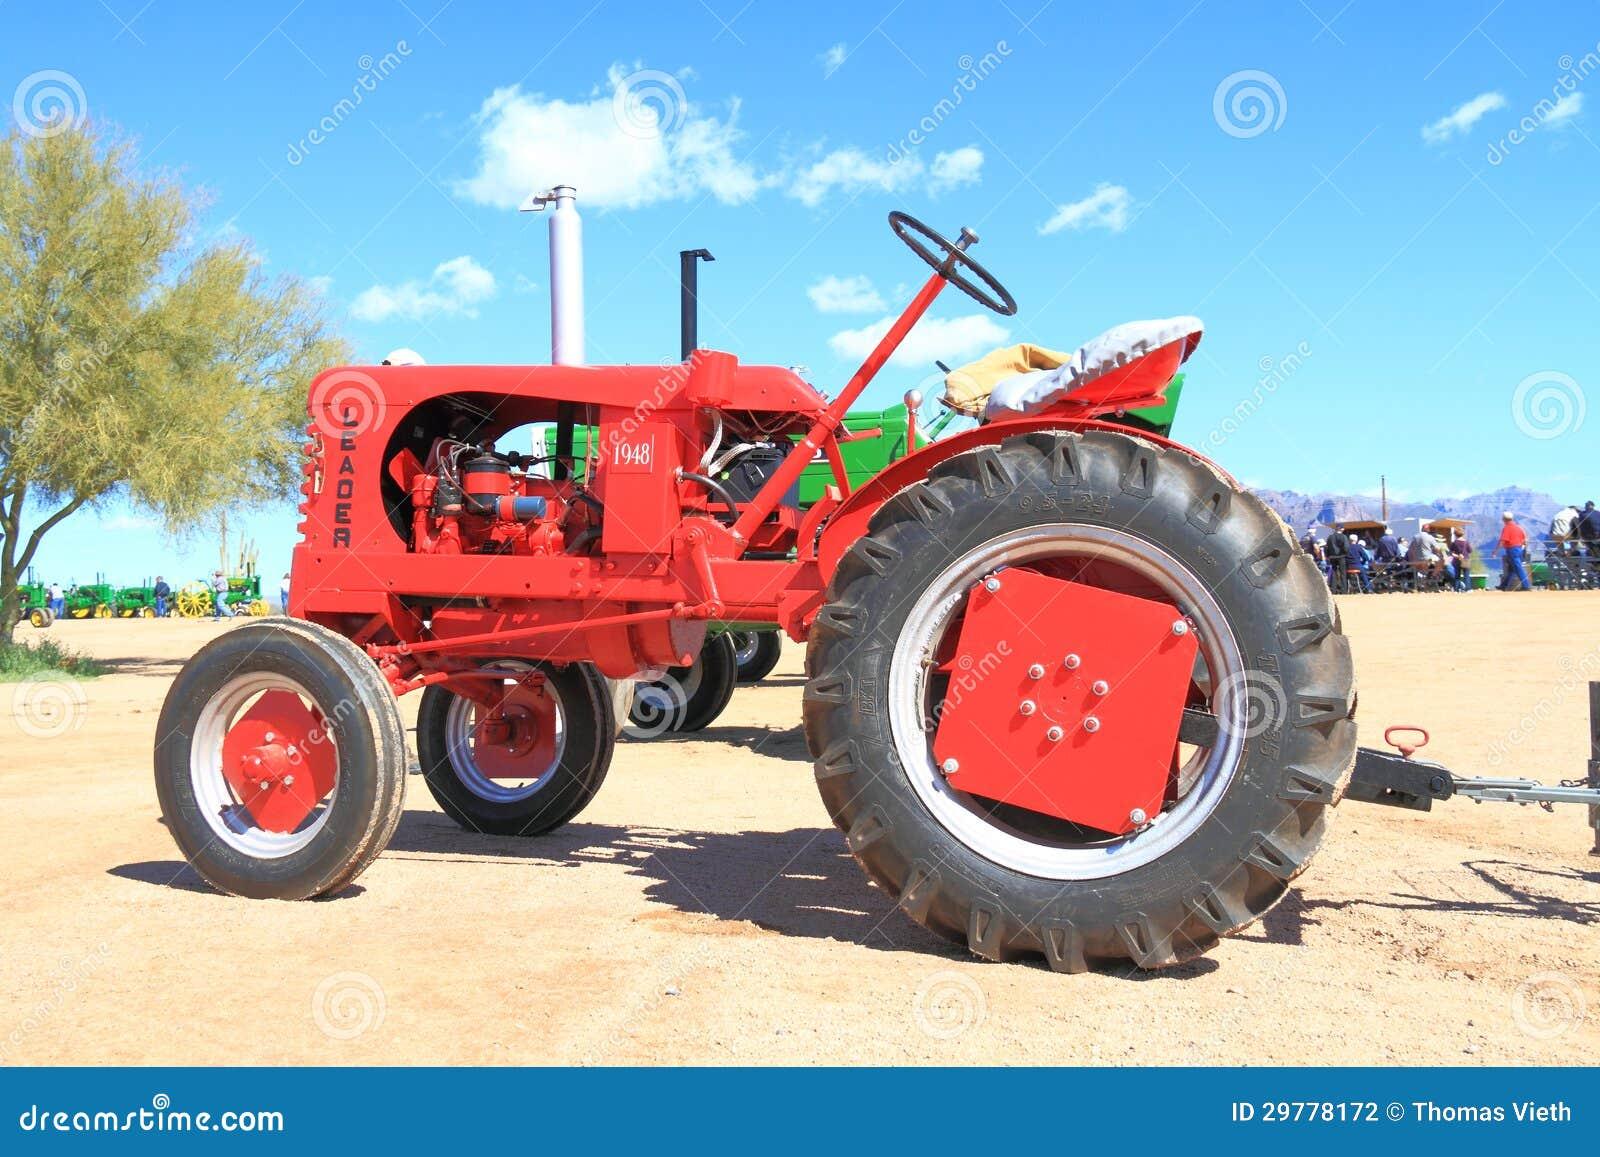 Antique Tractors In Ohio : Antique american tractor leader editorial